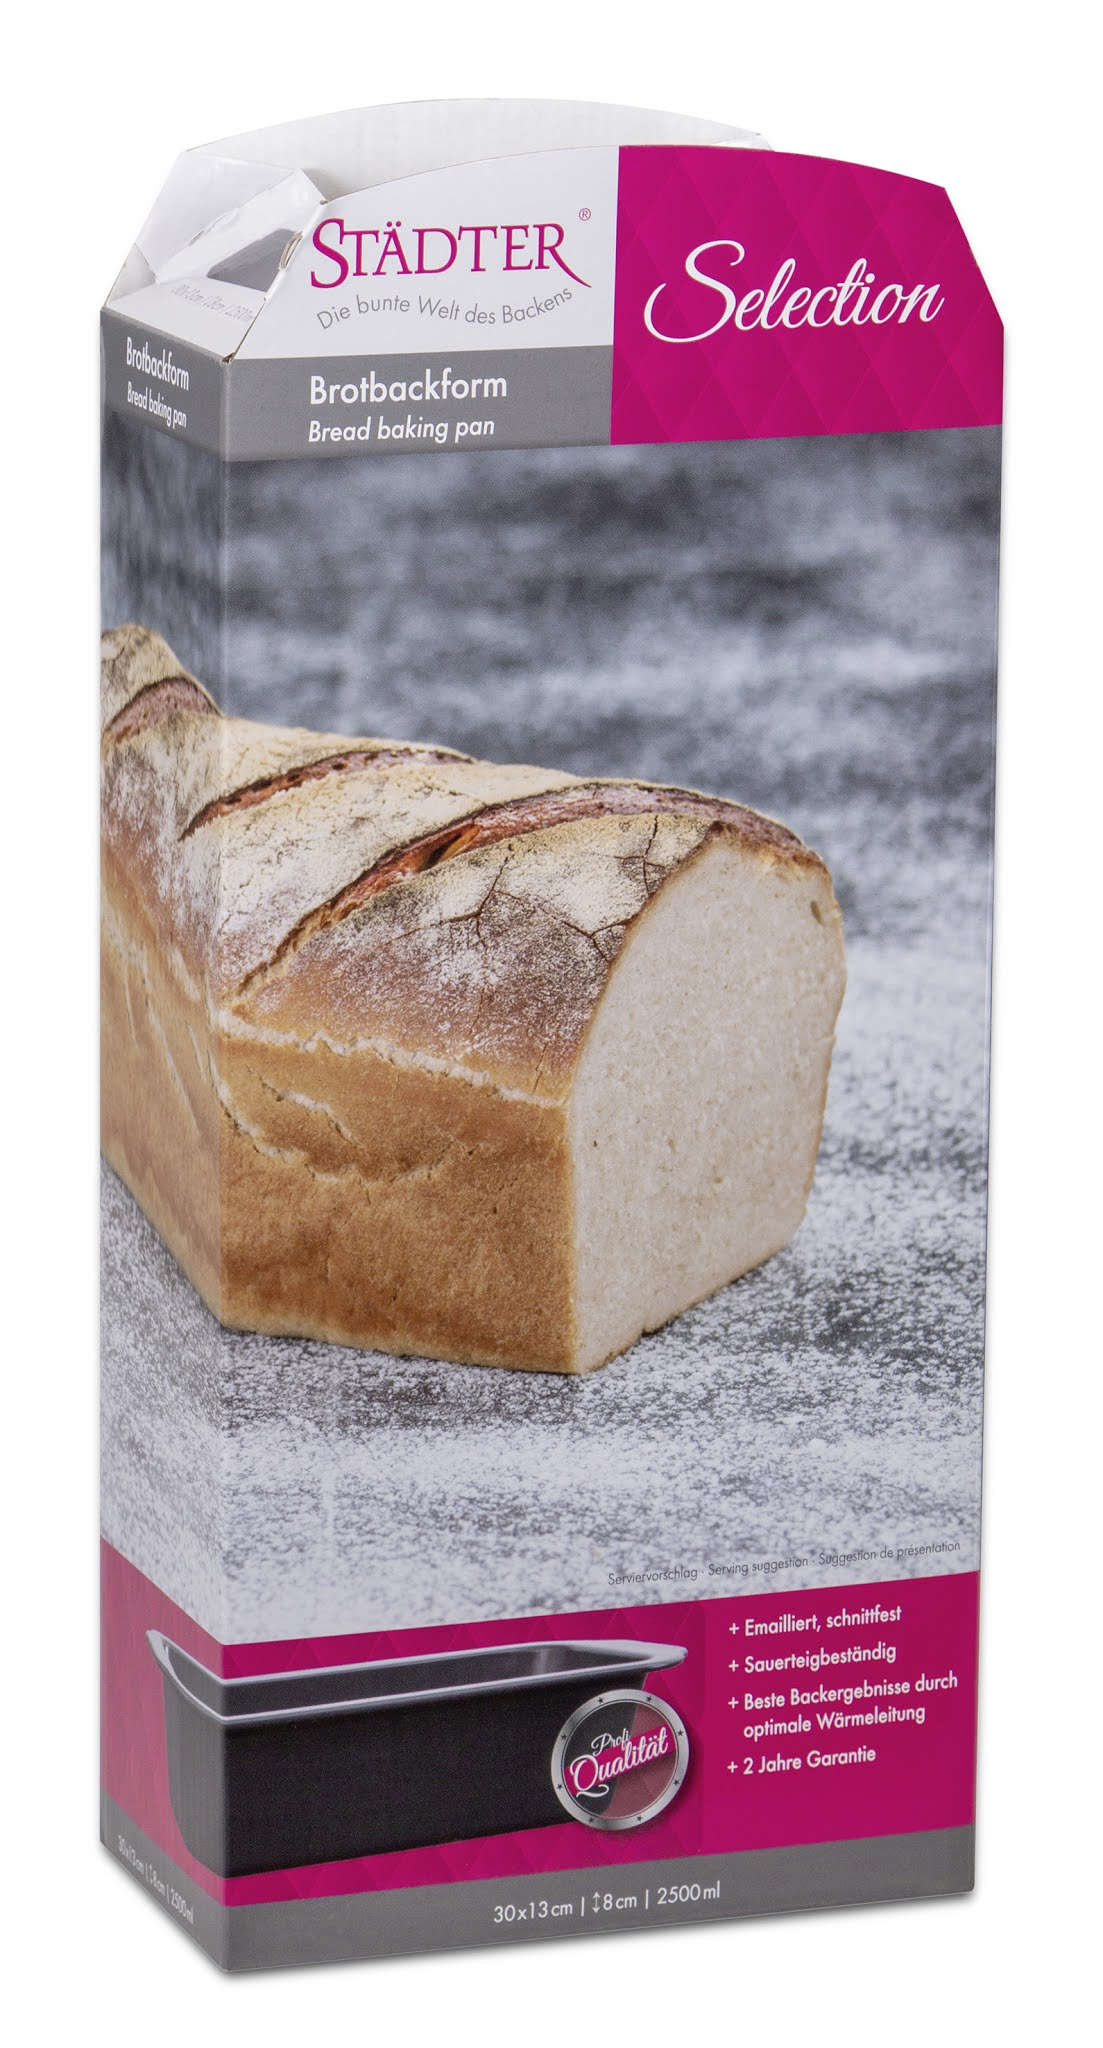 Selection Brot Backform der Firma Städter